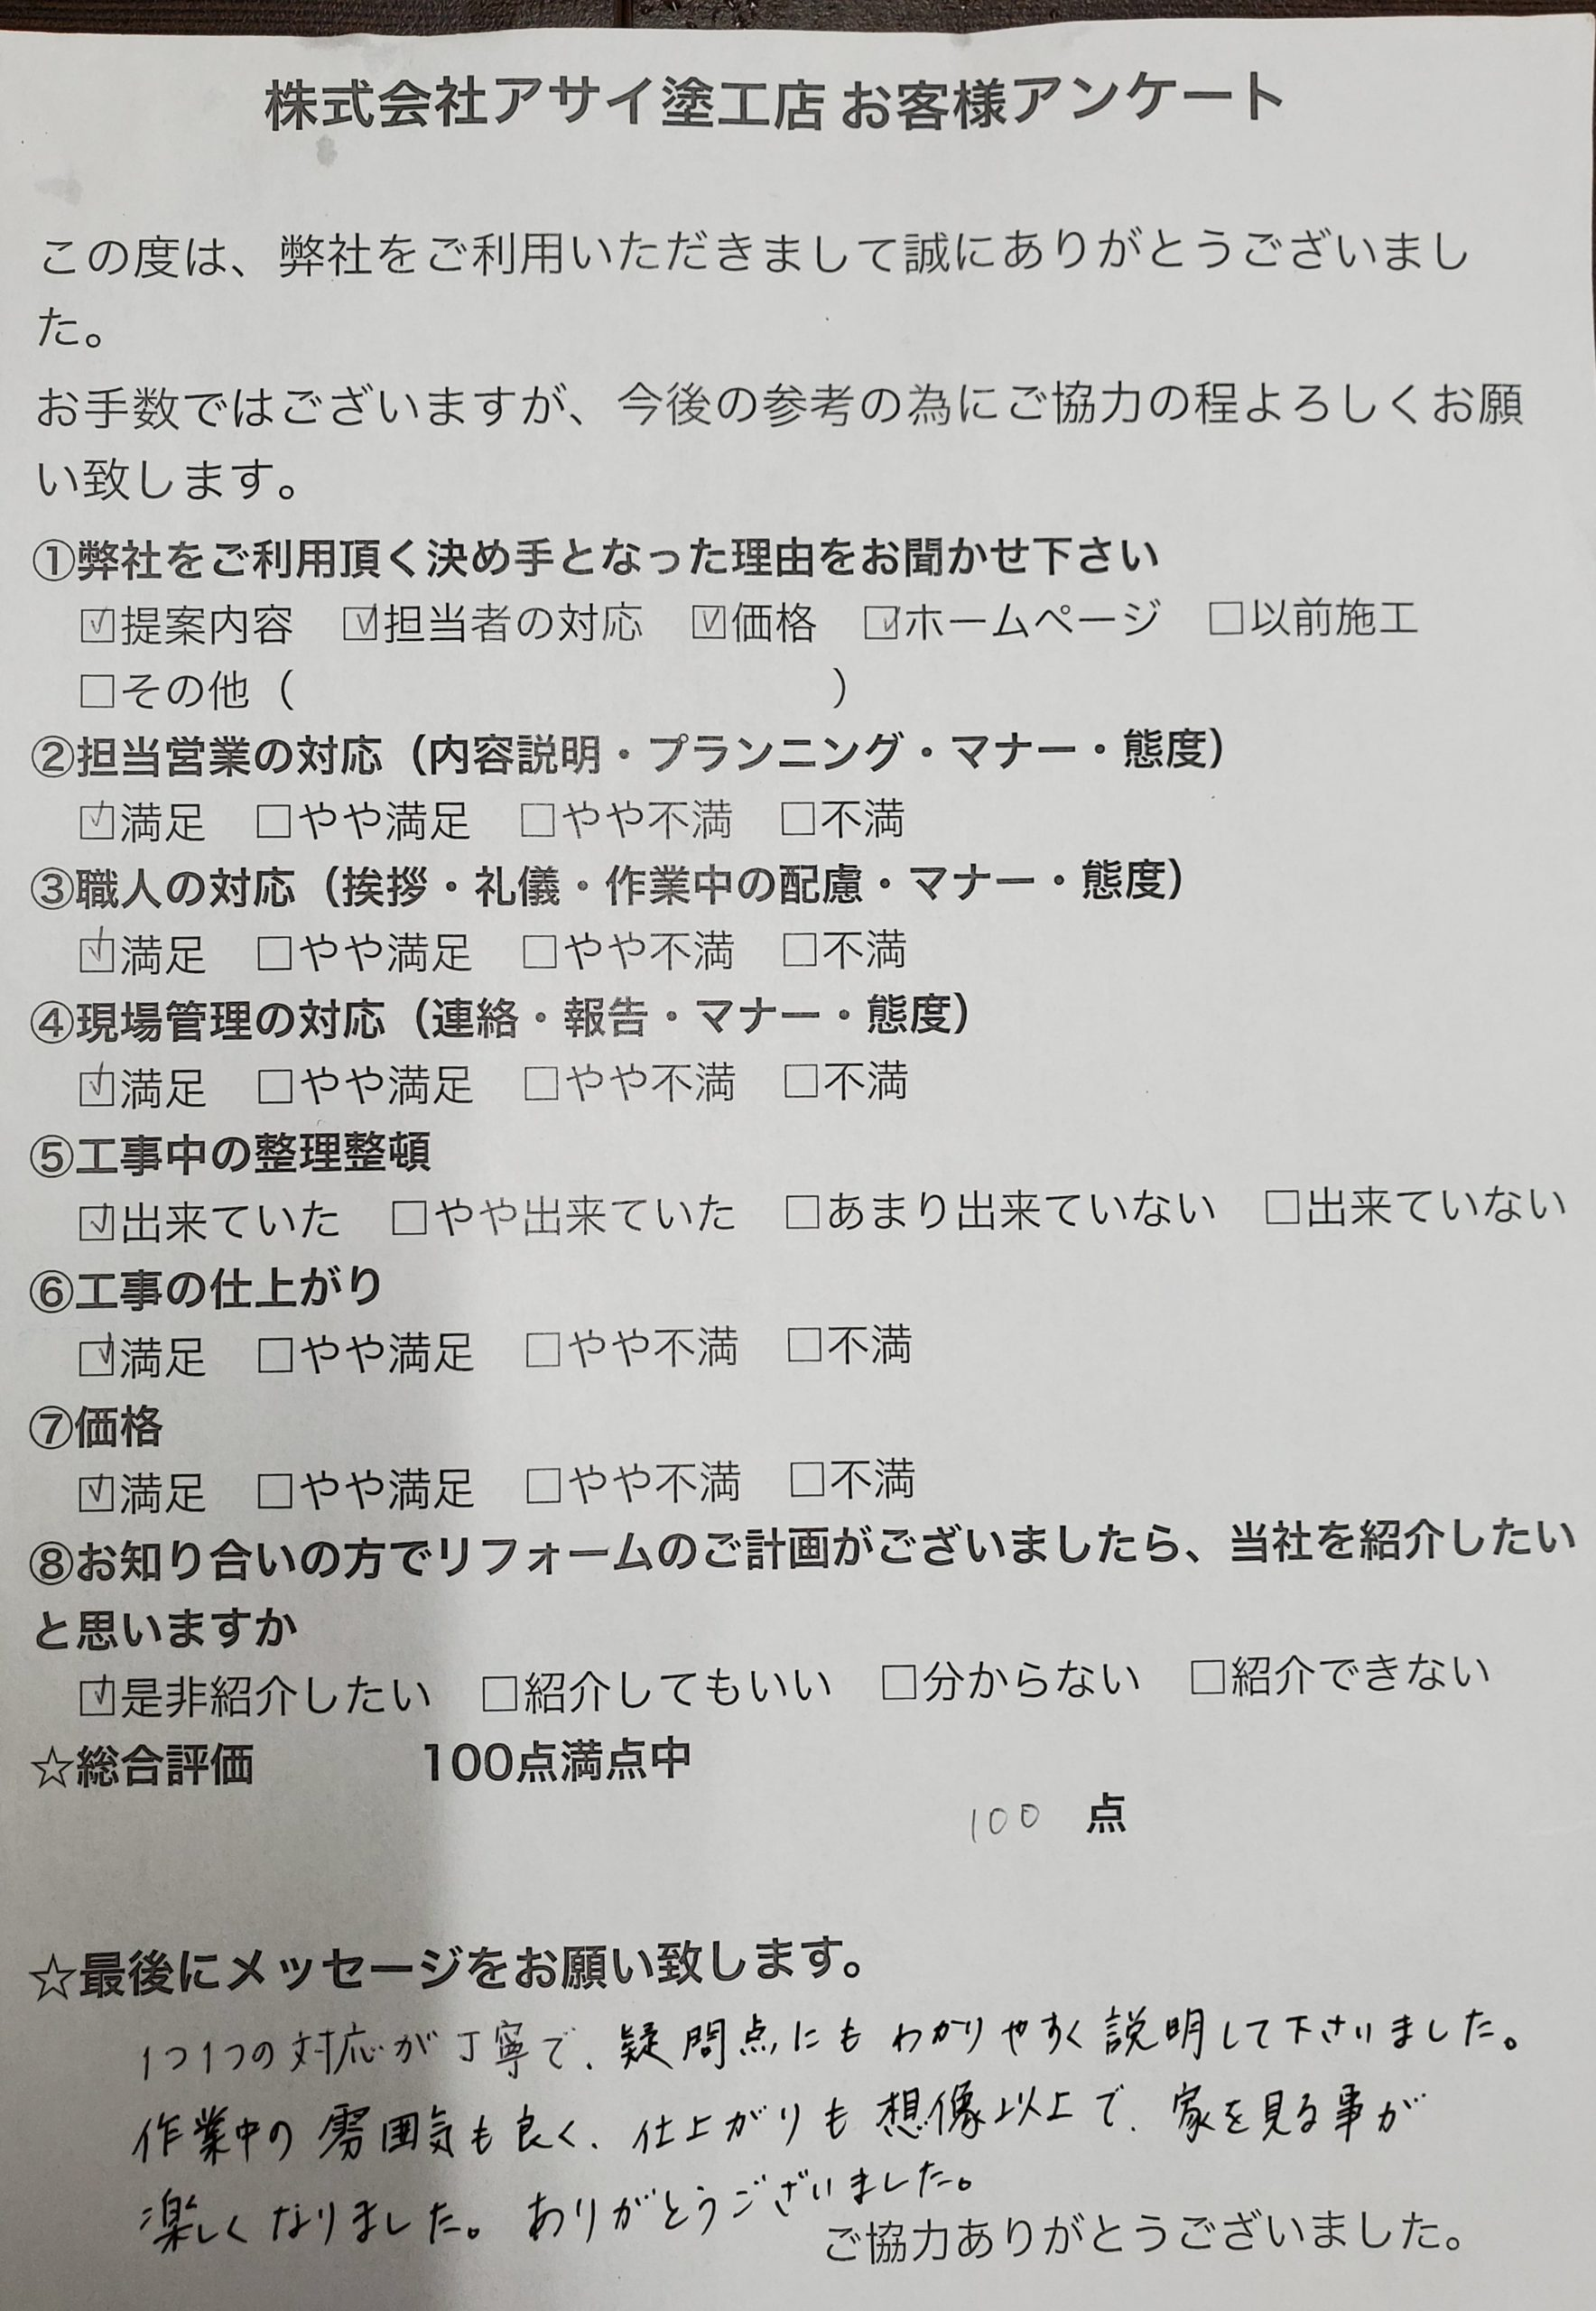 岐阜県瑞穂市K様邸 アンケート回答用紙